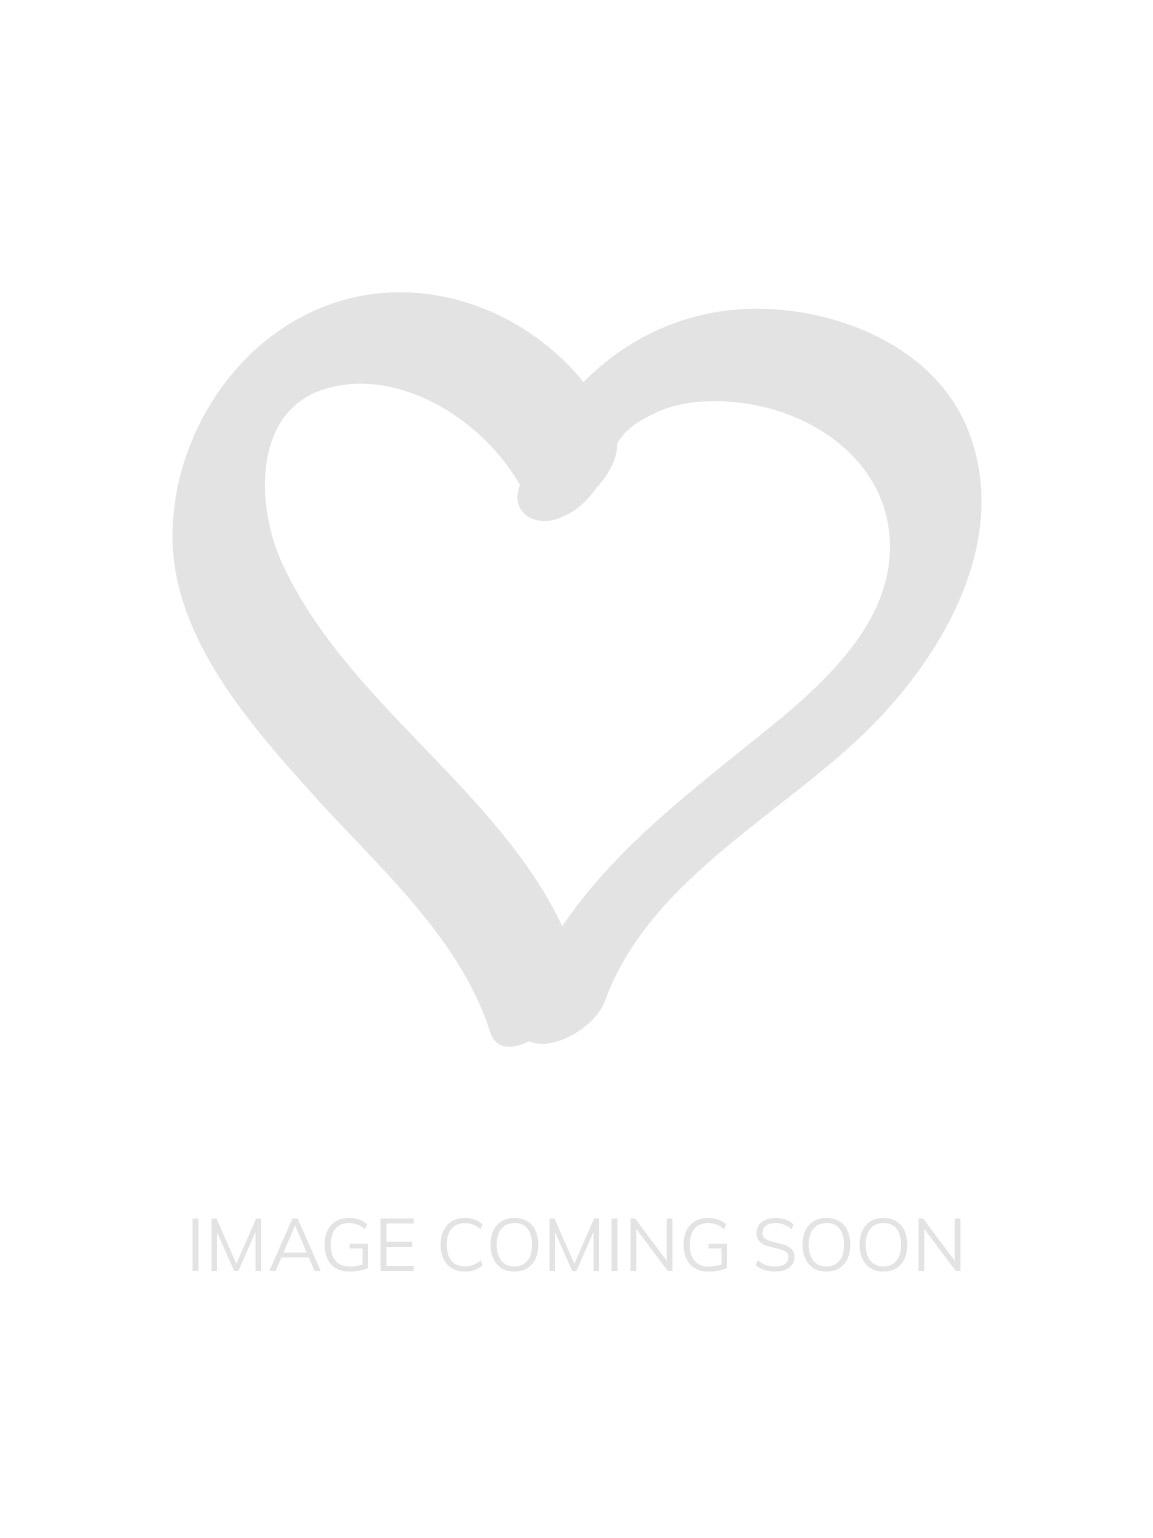 056150560d5df Sundance High Neck Swimsuit - Black | Lingerie Outlet Store